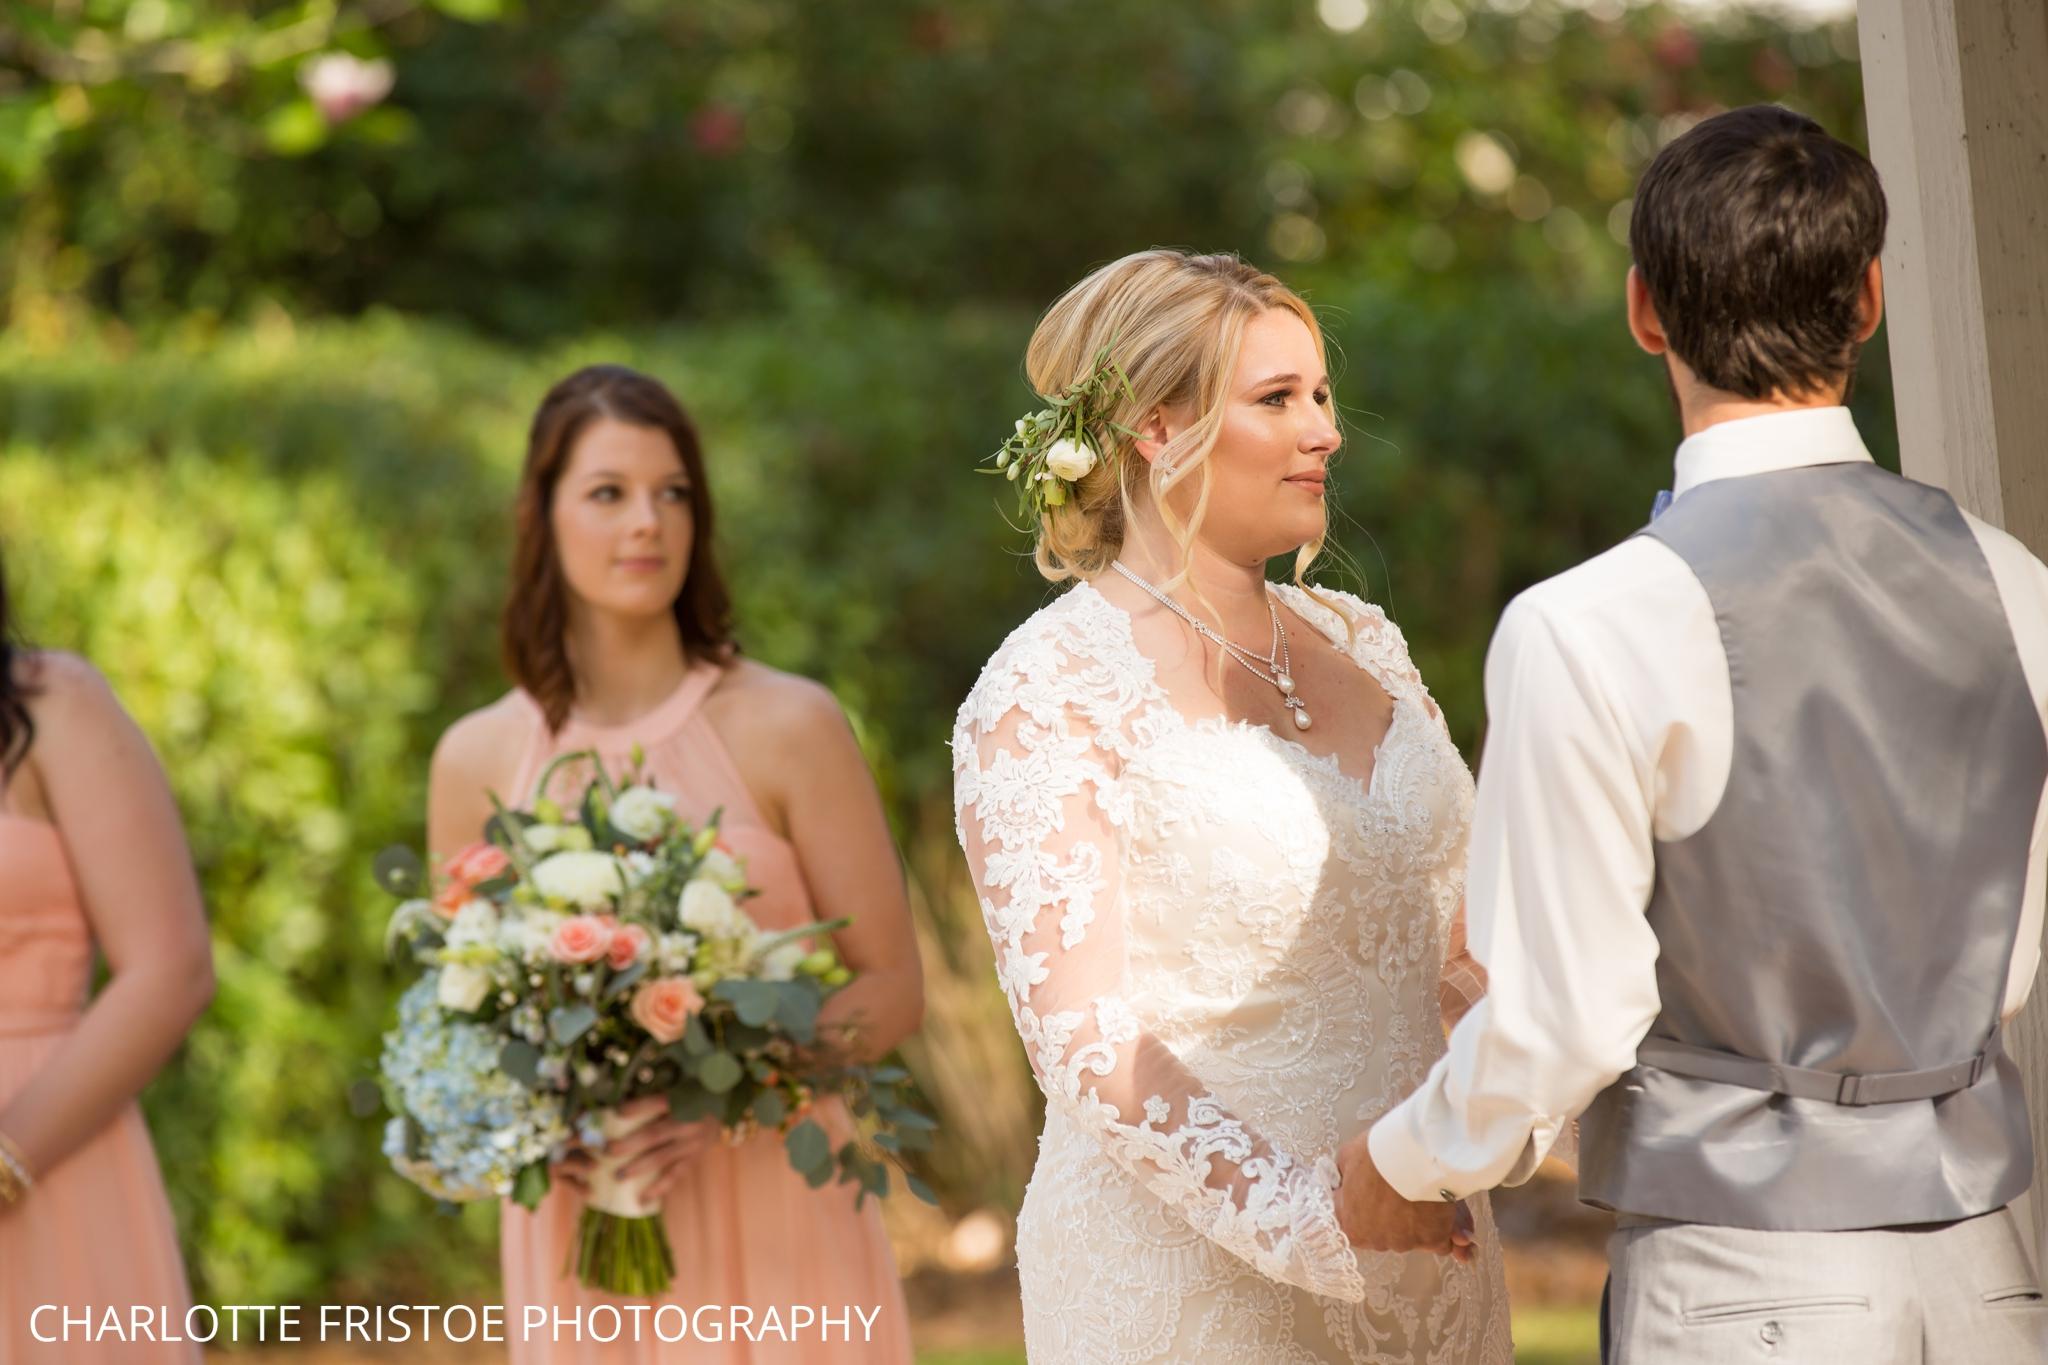 Charlotte Fristoe Photography Wedding-39.jpg